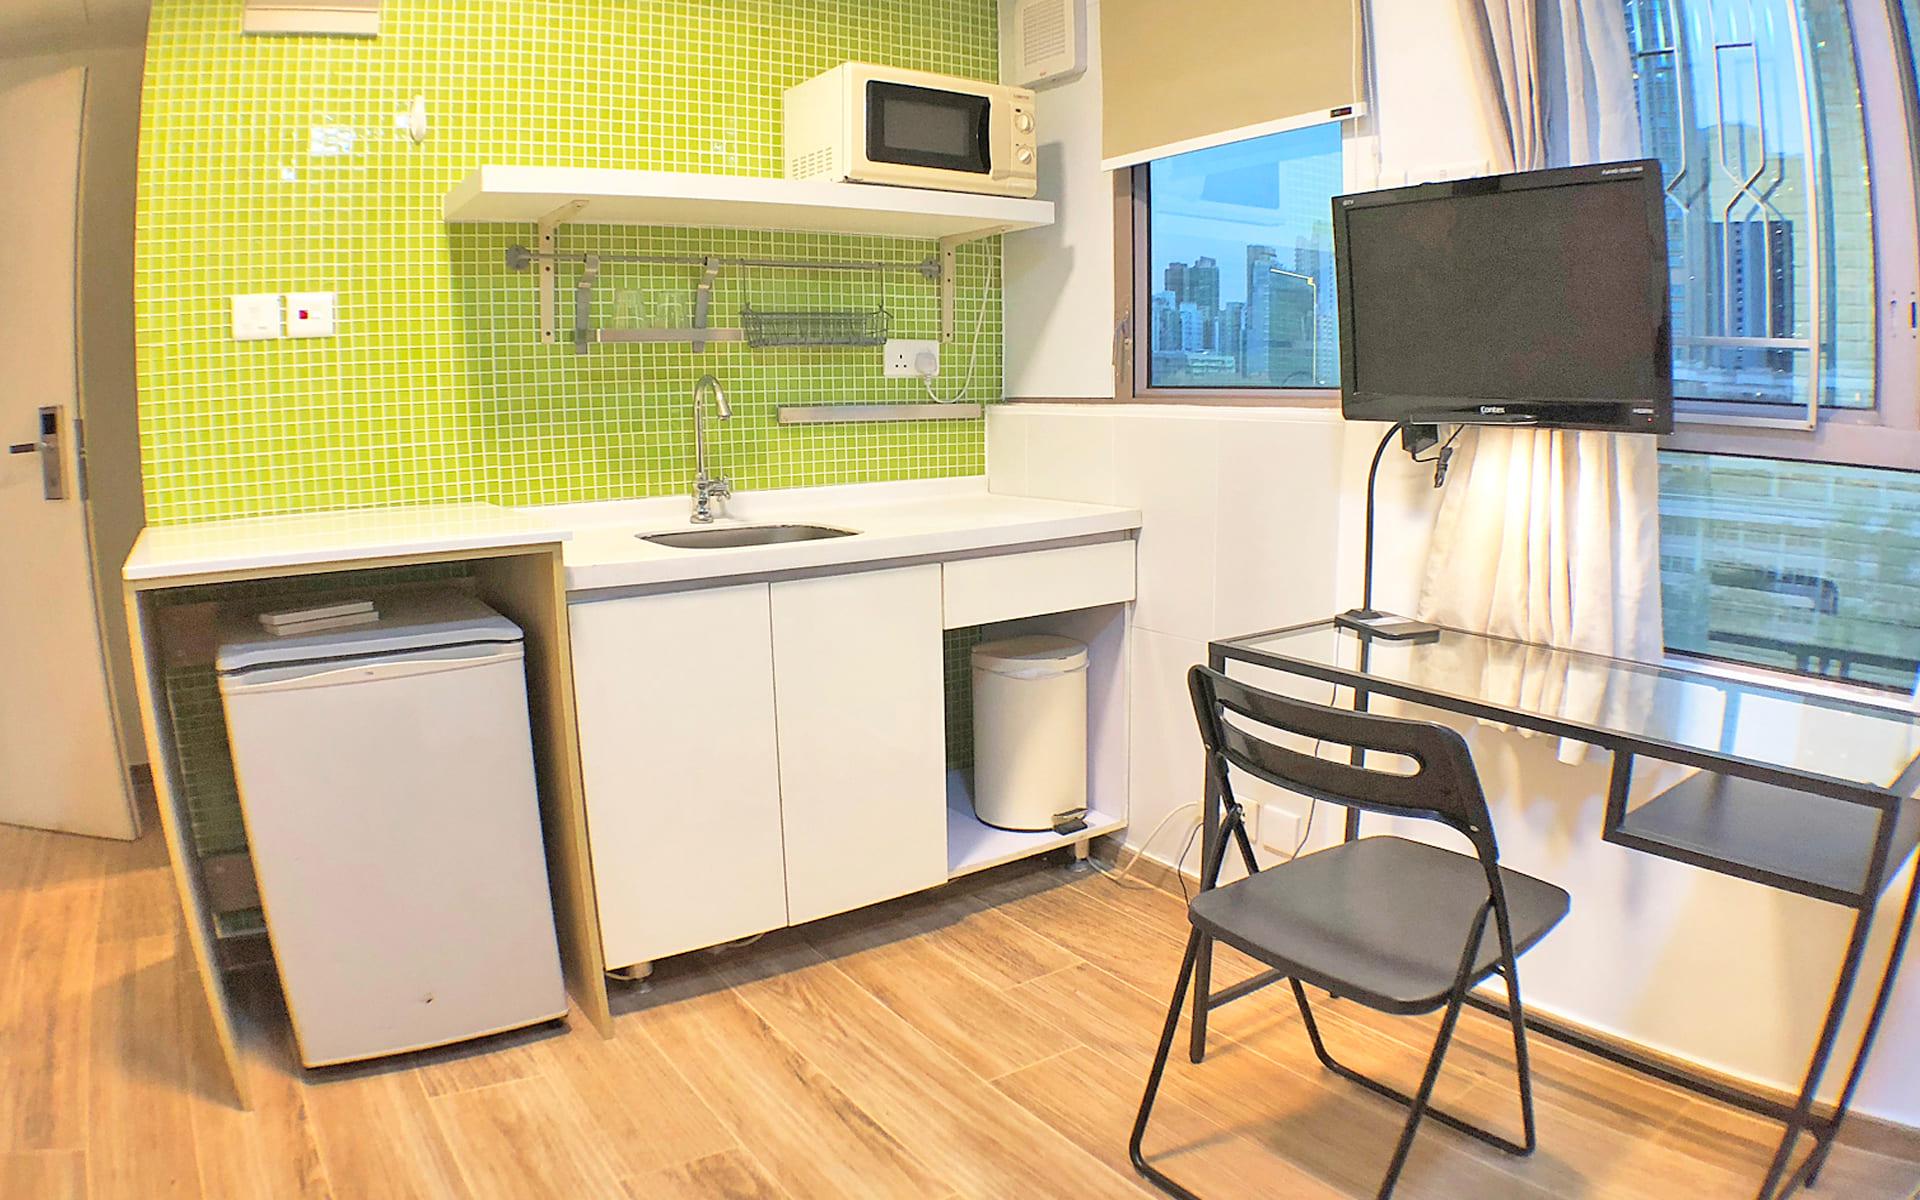 hk_service_apartment_21391943741580801987.jpg